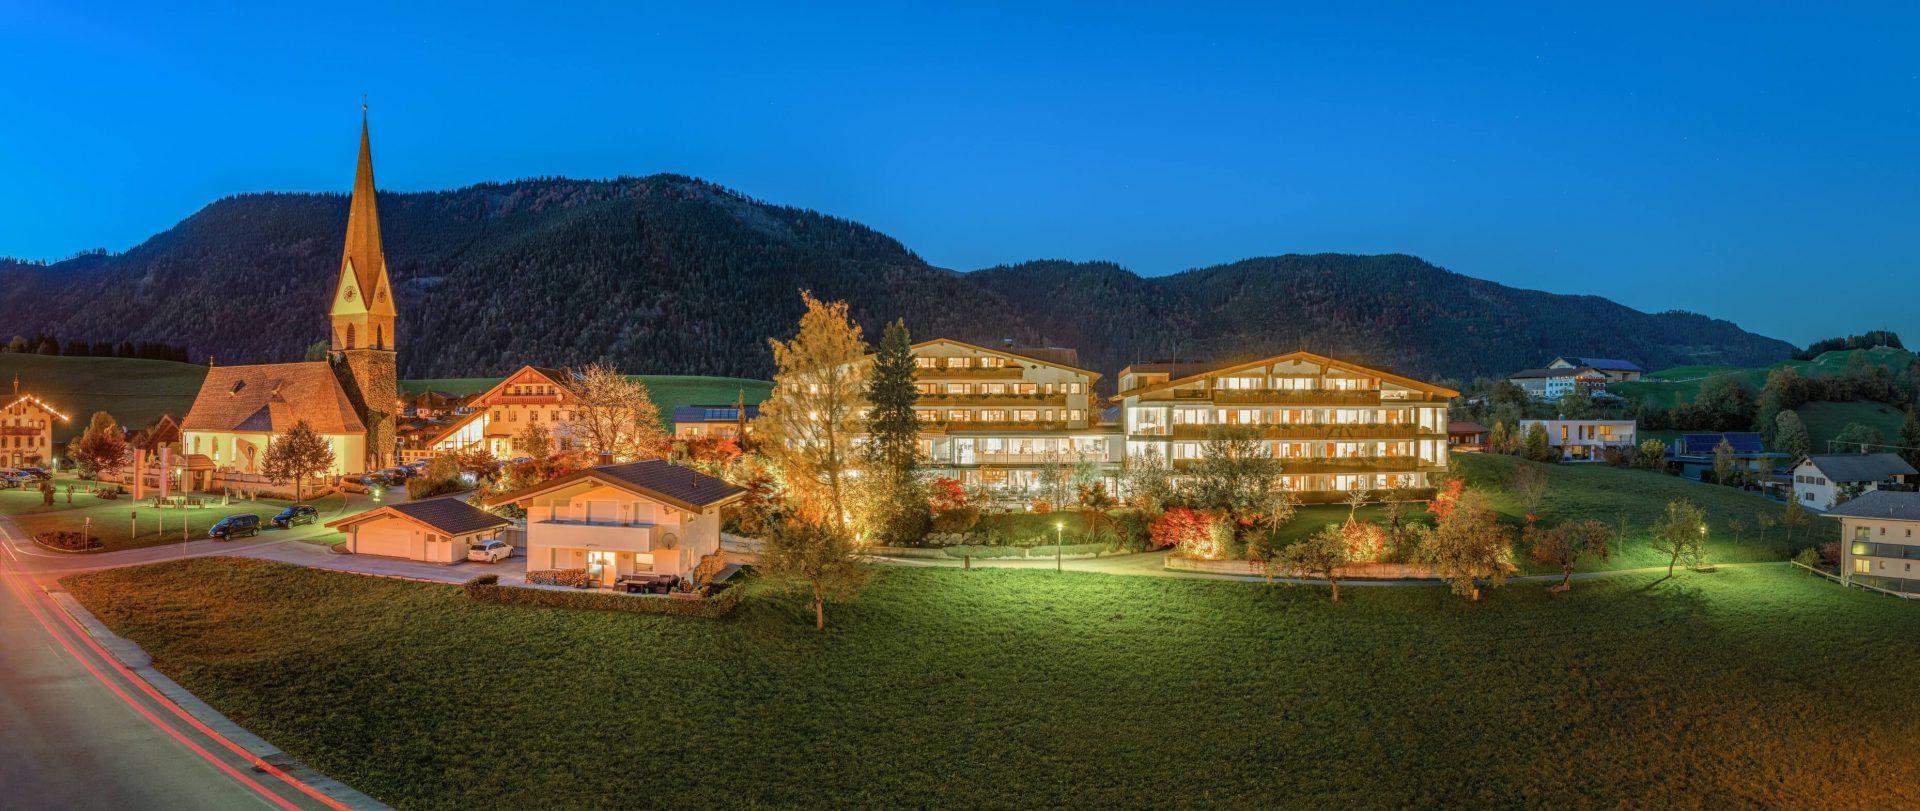 Das Juffing Hotel & Spa